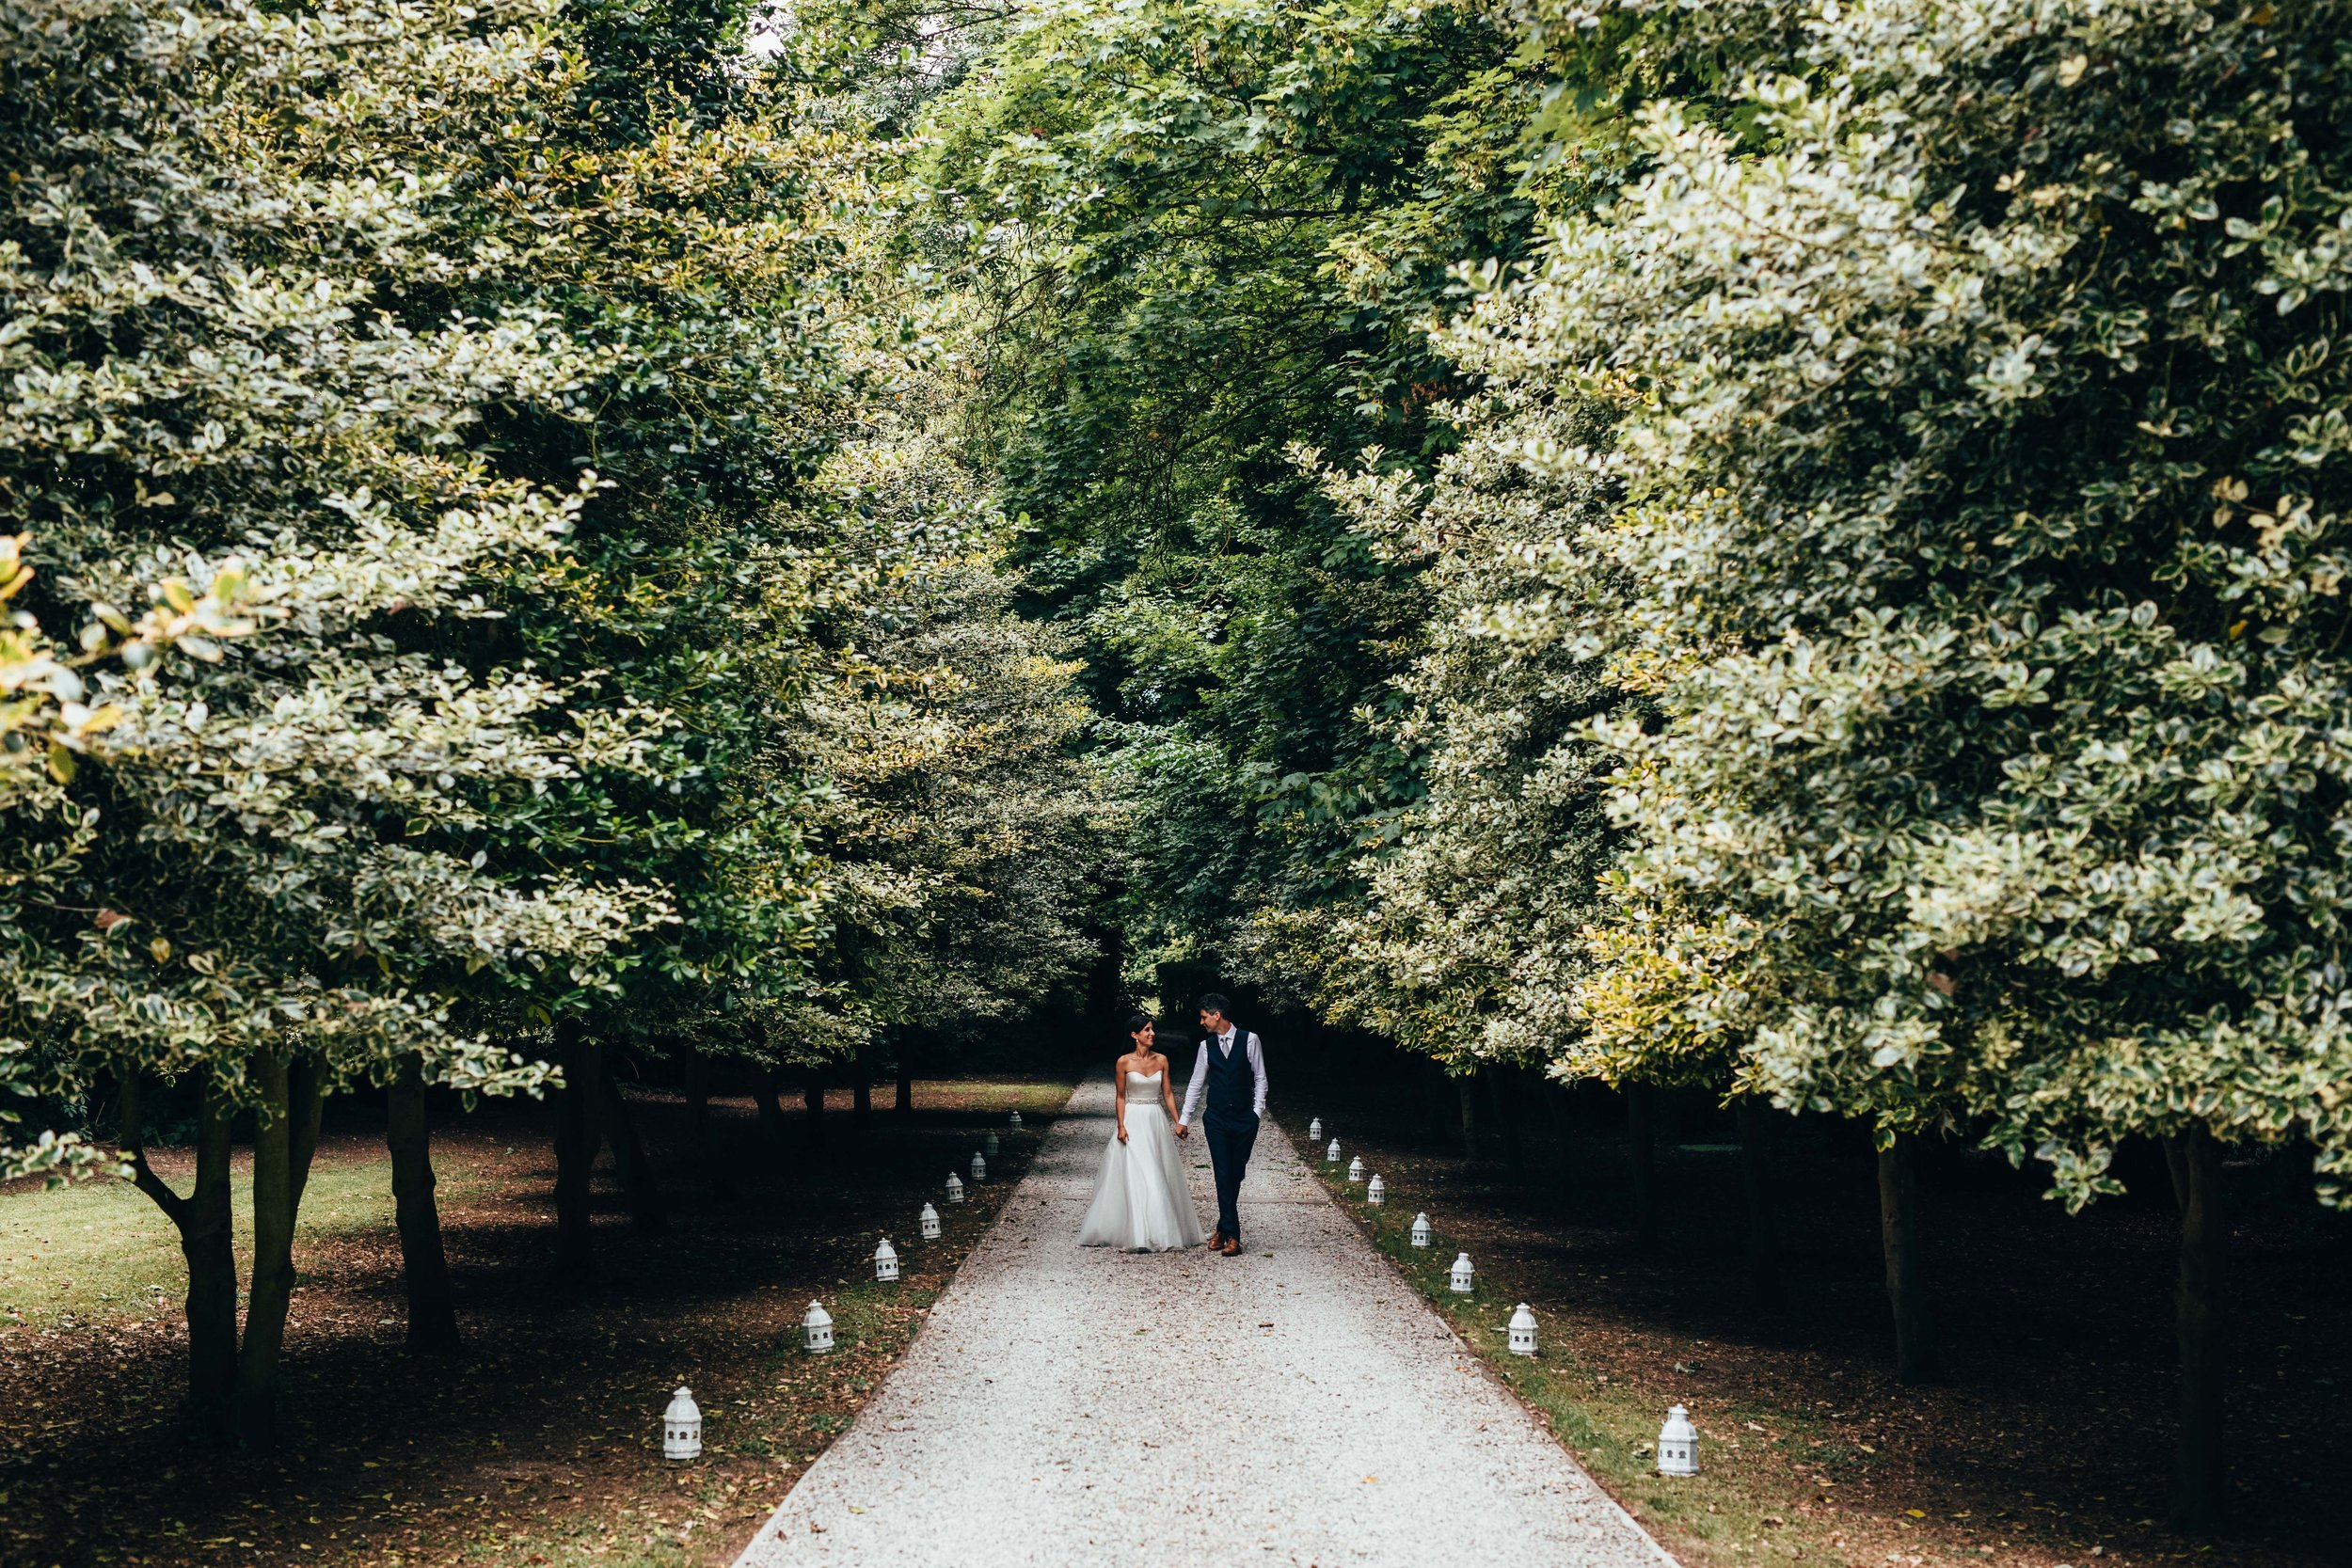 wedding-day-forest.jpg